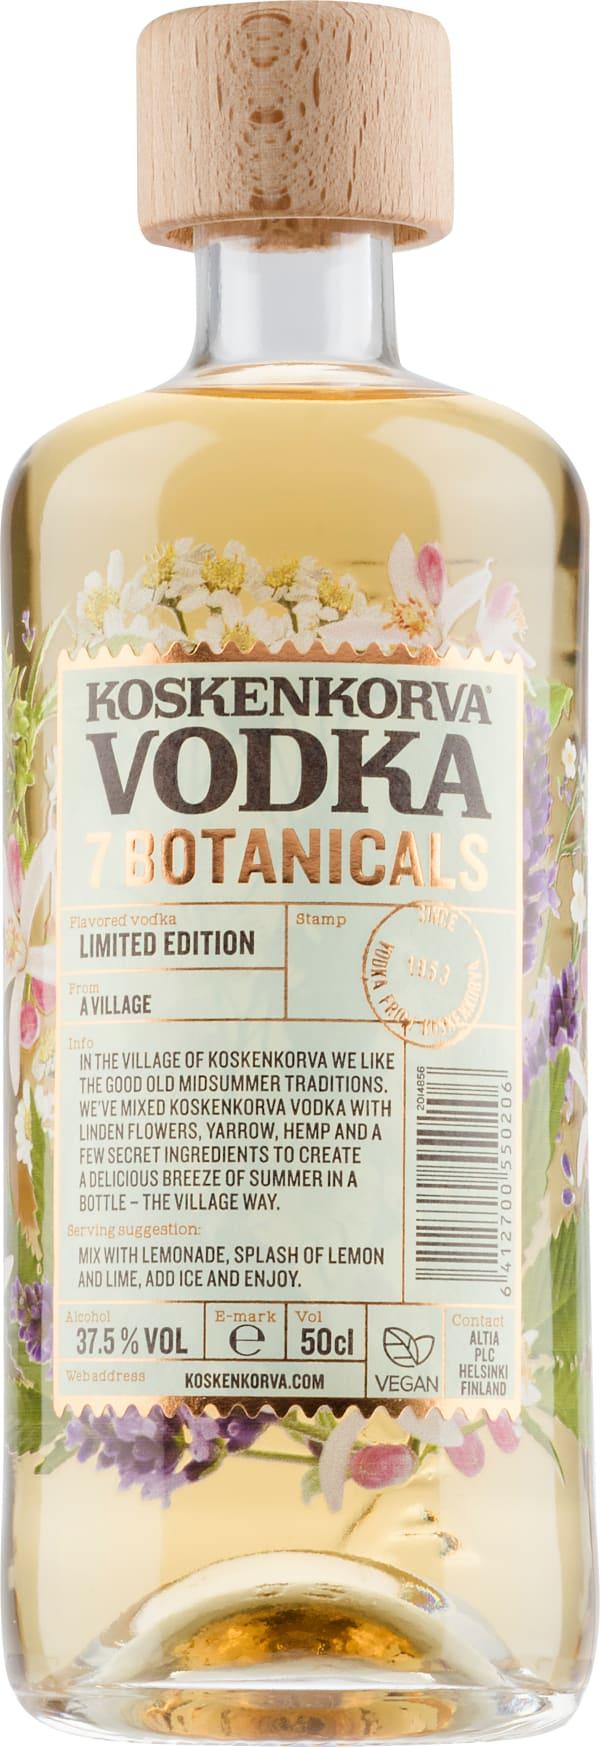 Koskenkorva Vodka 7 Botanicals